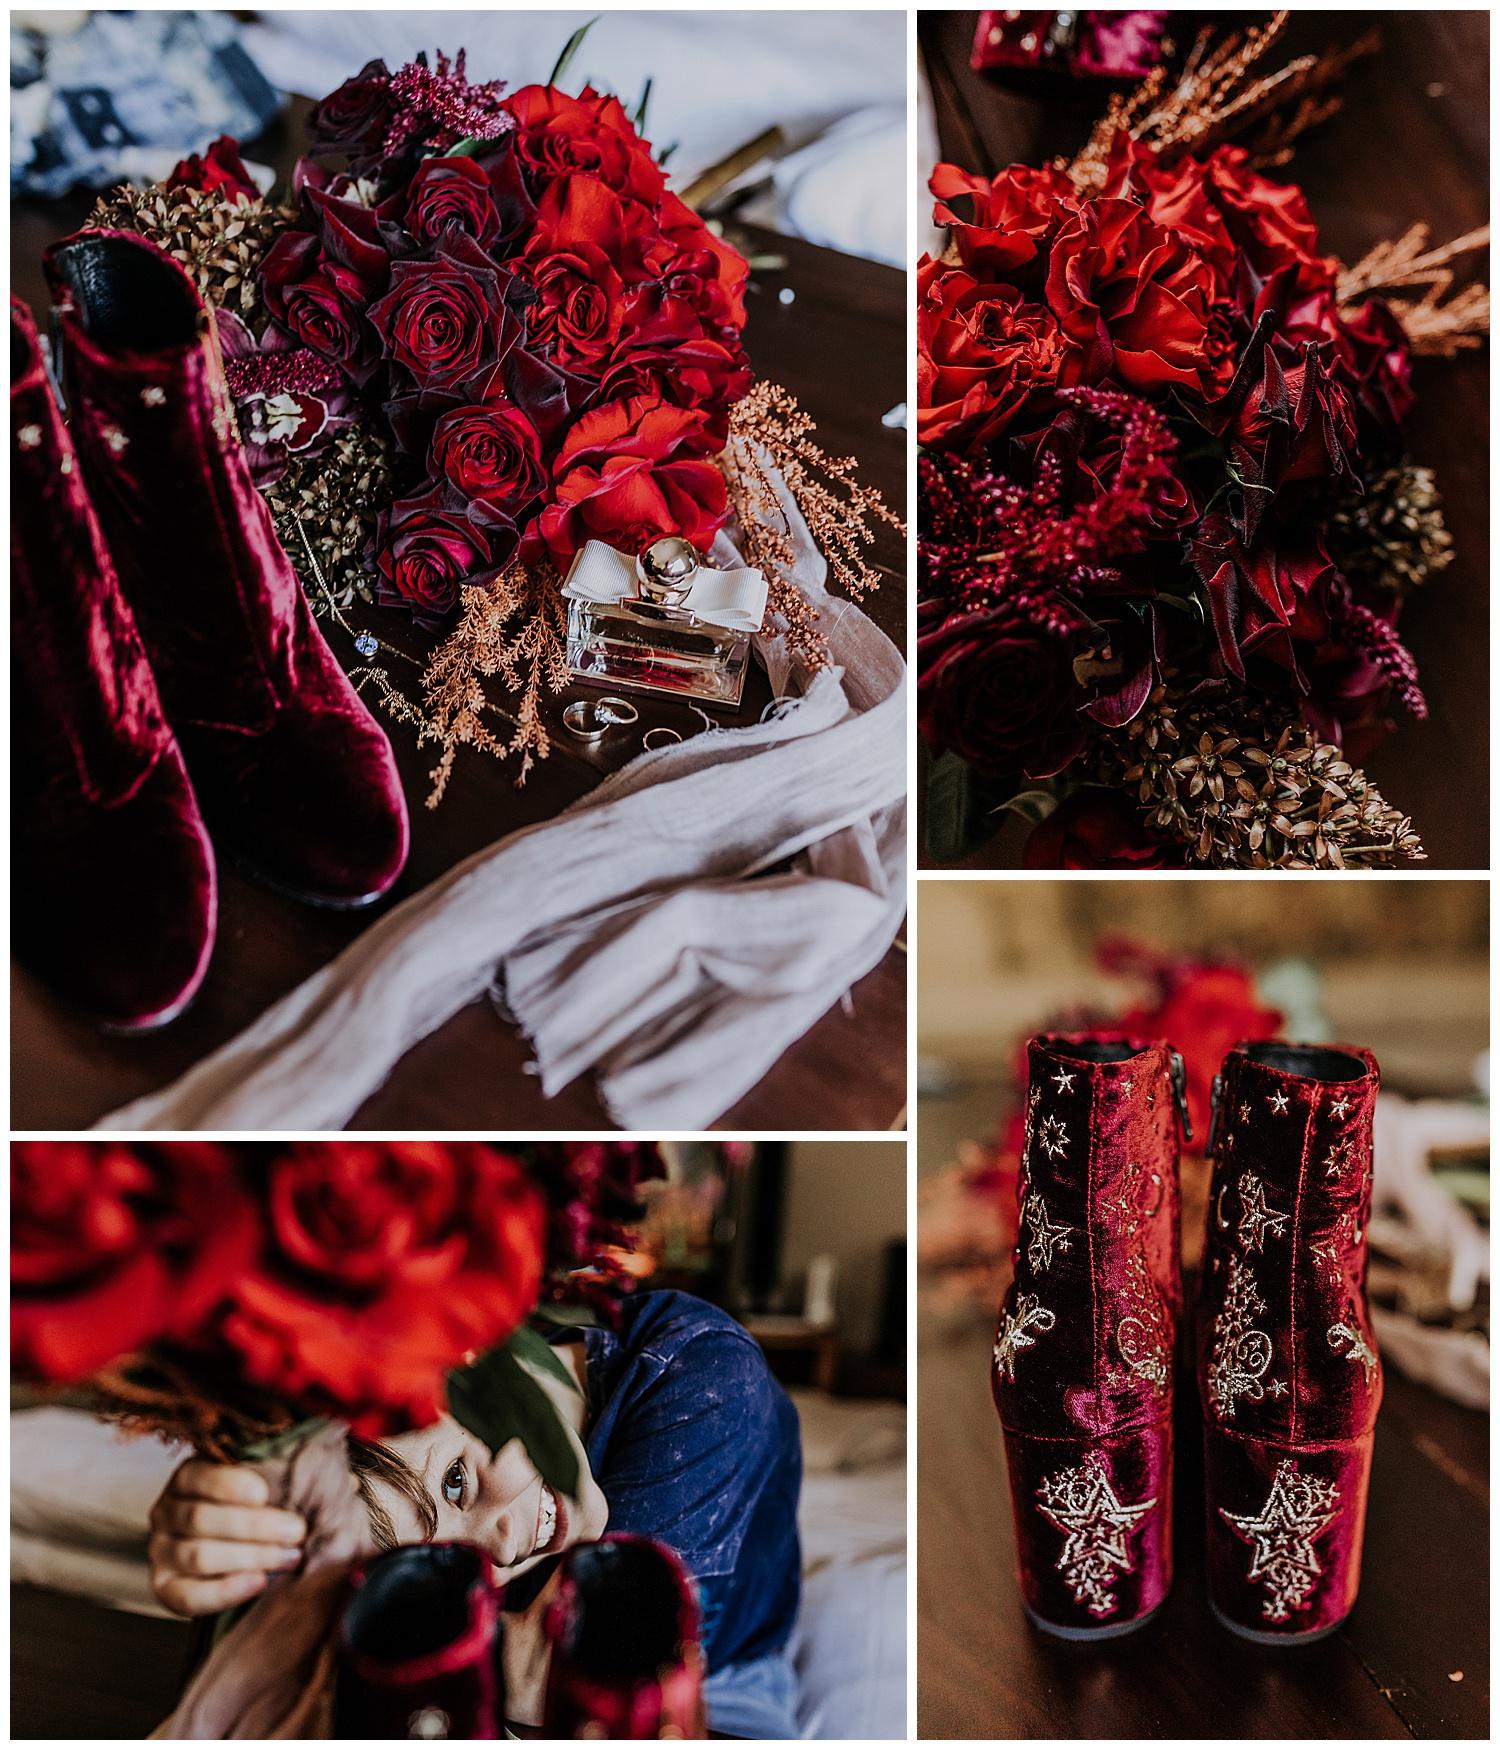 katie_jake_keeper_creative_wedding_photographer_01.JPG